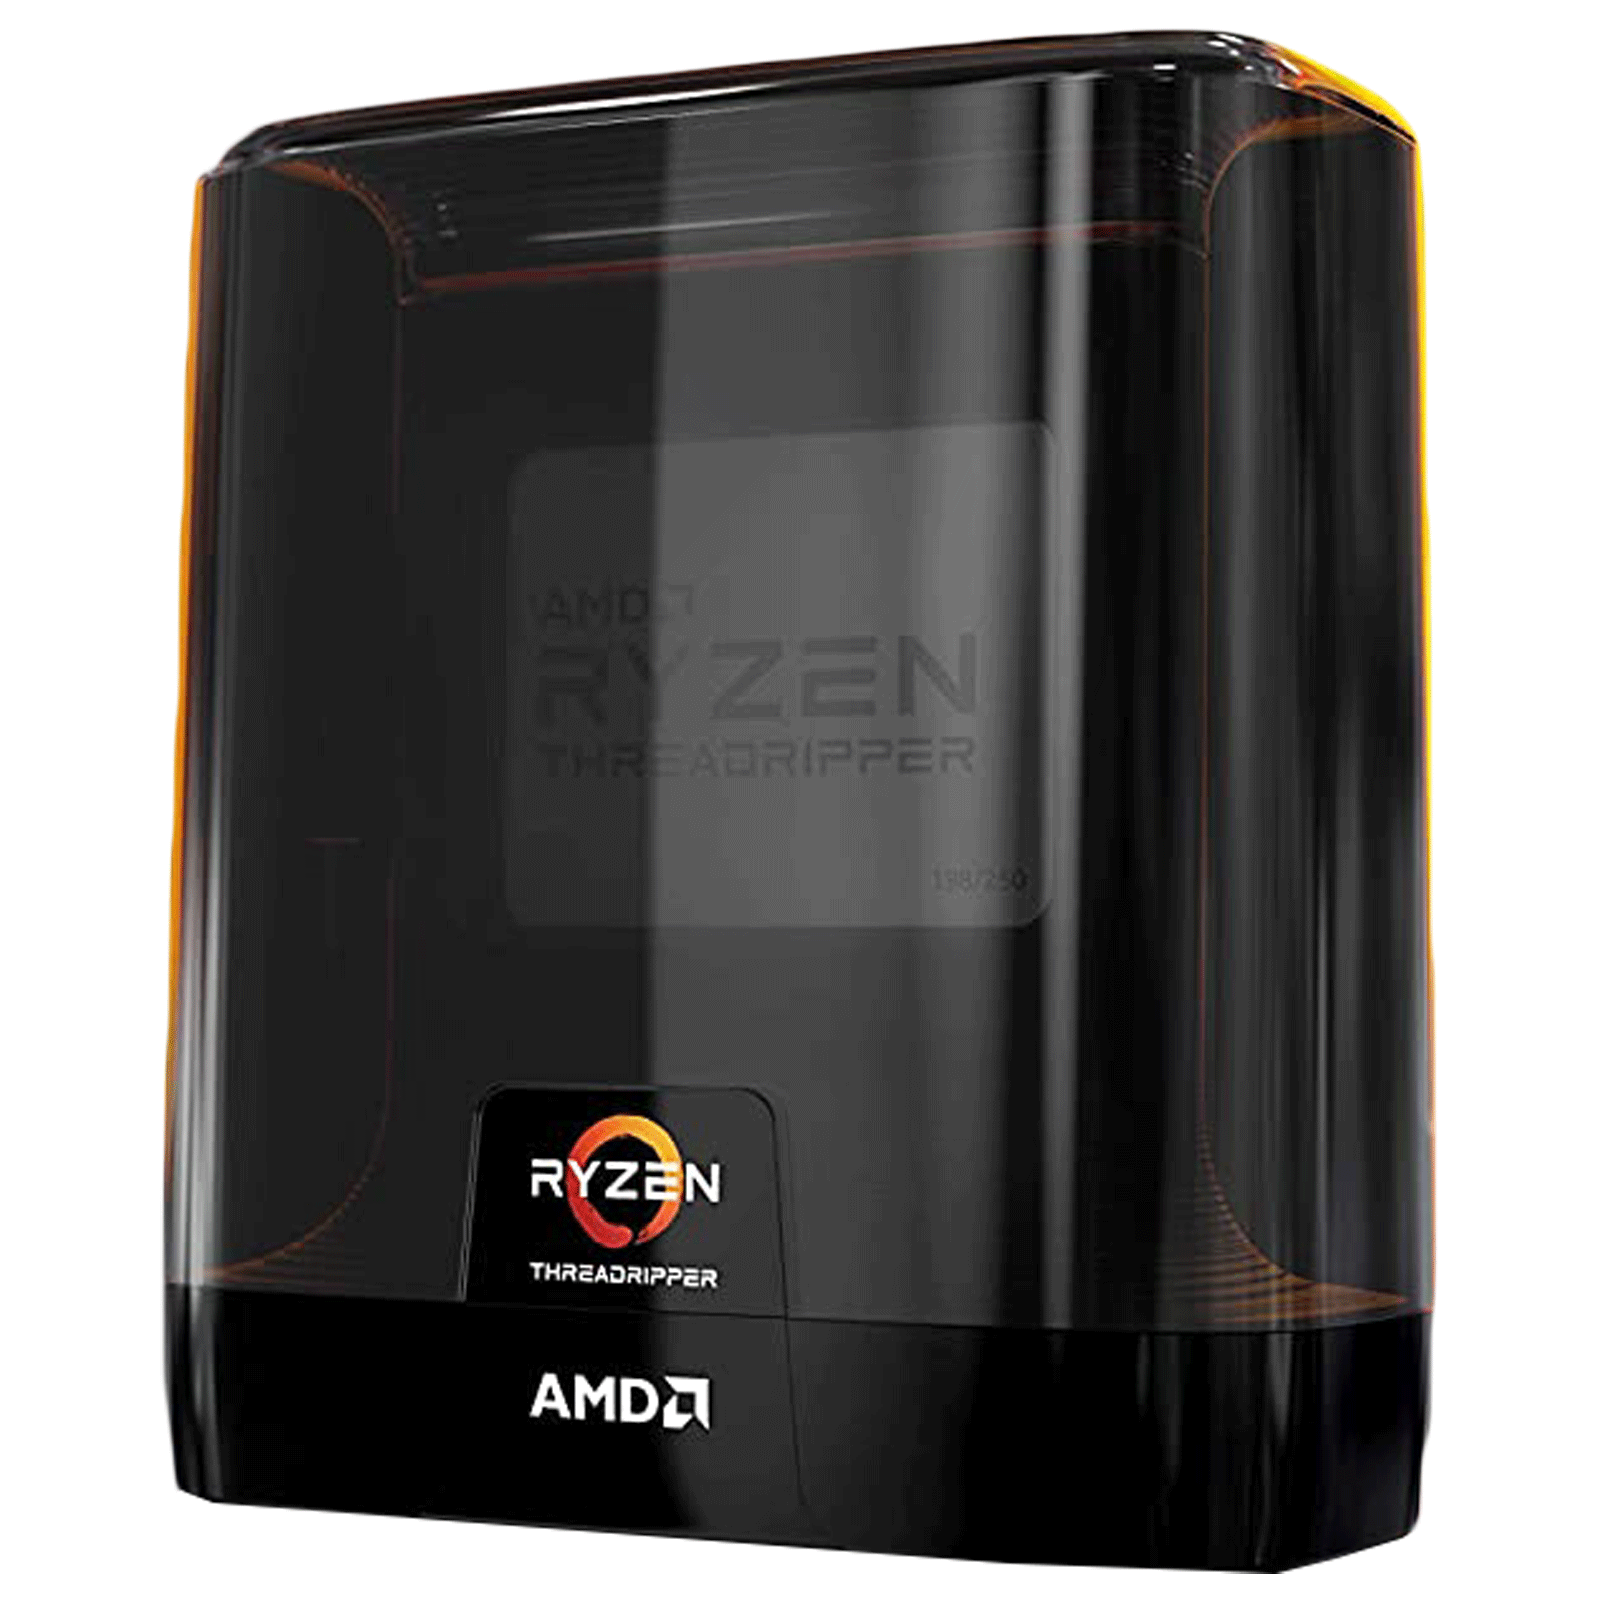 AMD Ryzen Threadripper Desktop Processor (32 Cores, 3.7 GHz, AMD Zen Core Architecture, 3970X, Silver)_1